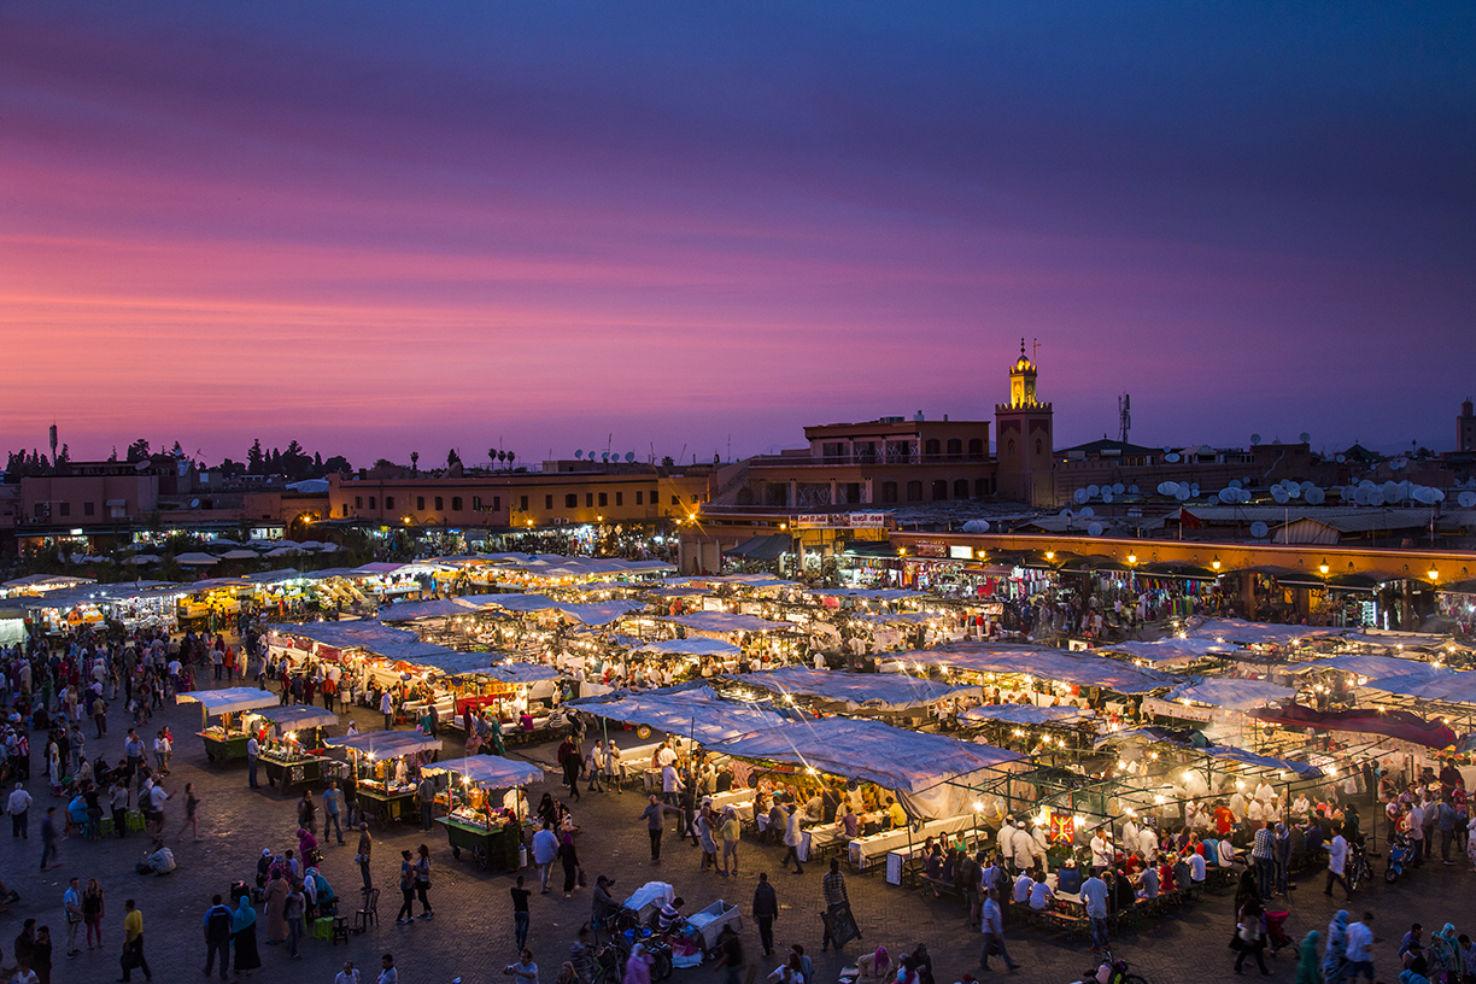 Marrakech's Djemaa el-Fna will delight all your senses